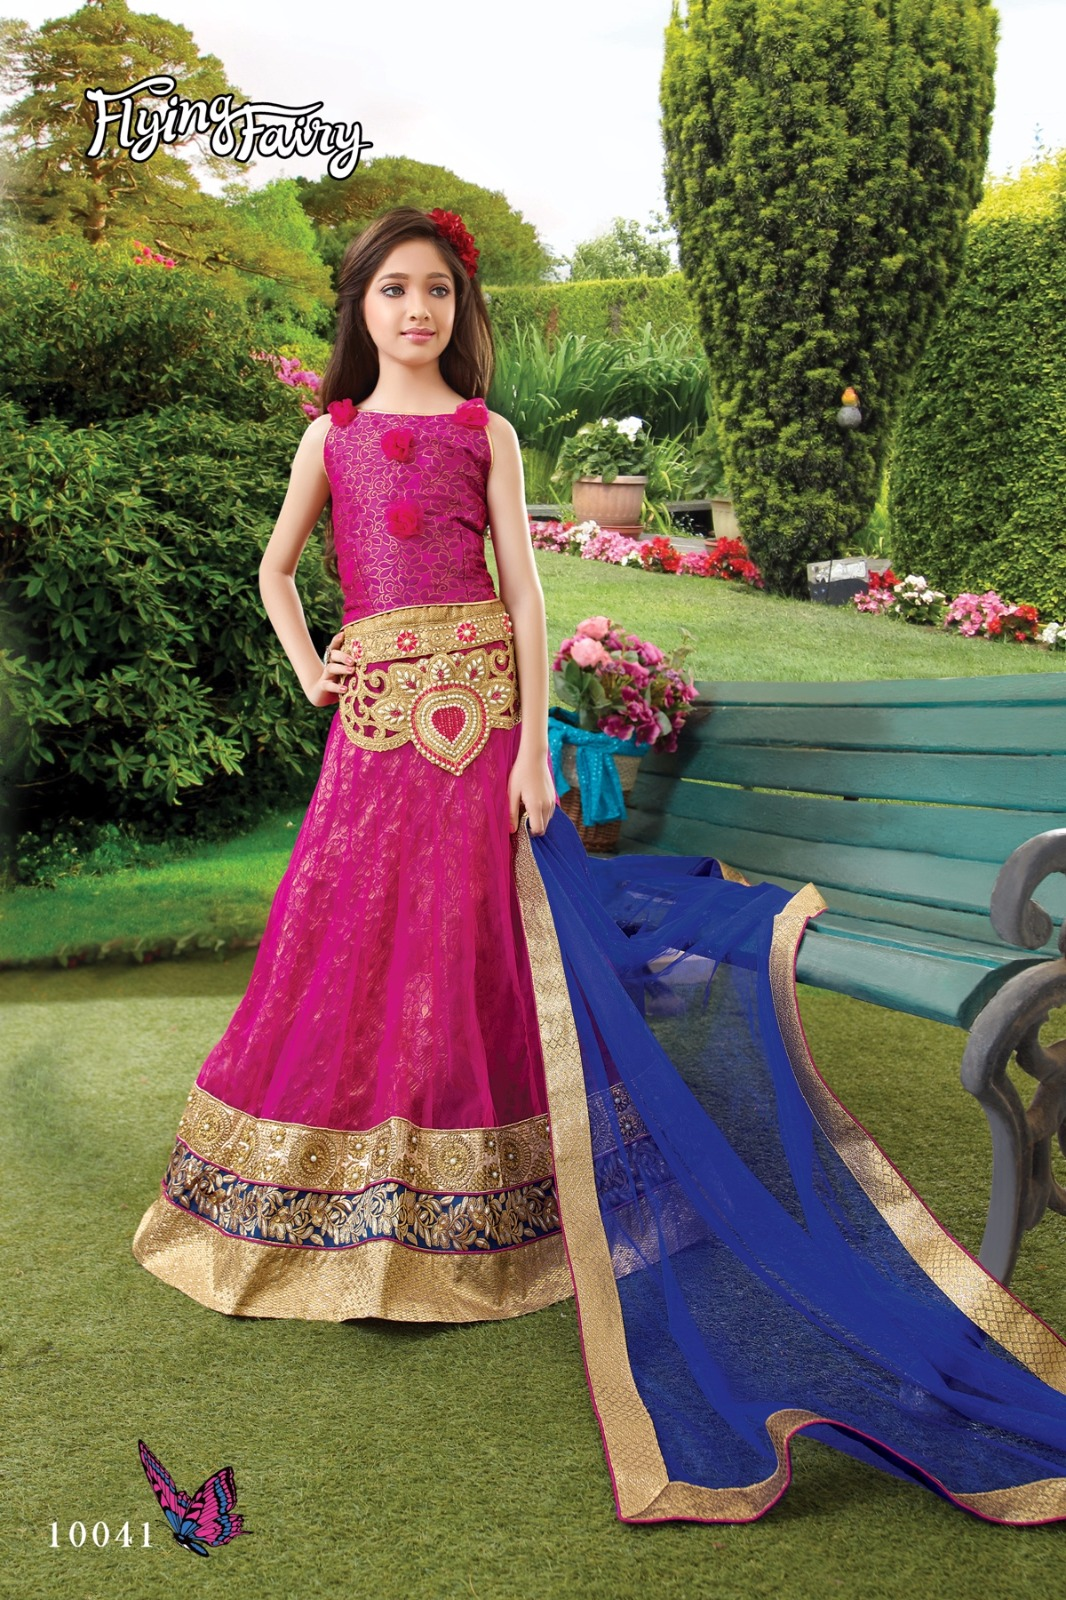 Flying Fairy – Children Wear Stylish And Heavy Embroidery Lehenga Choli